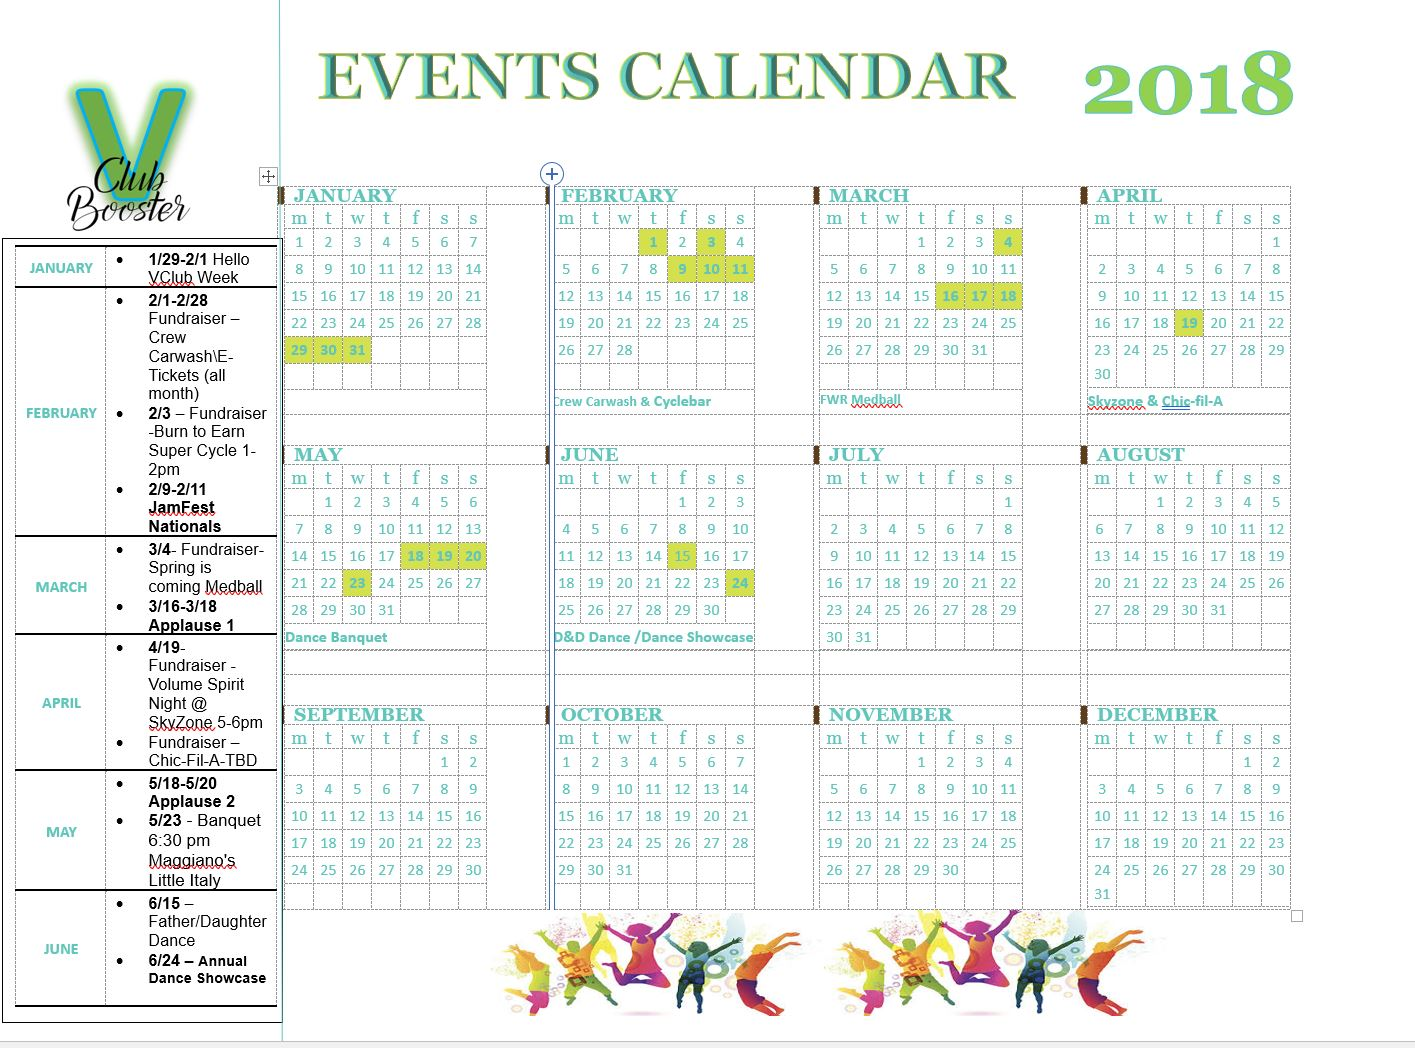 VClub 2018 Calendar of Events.JPG